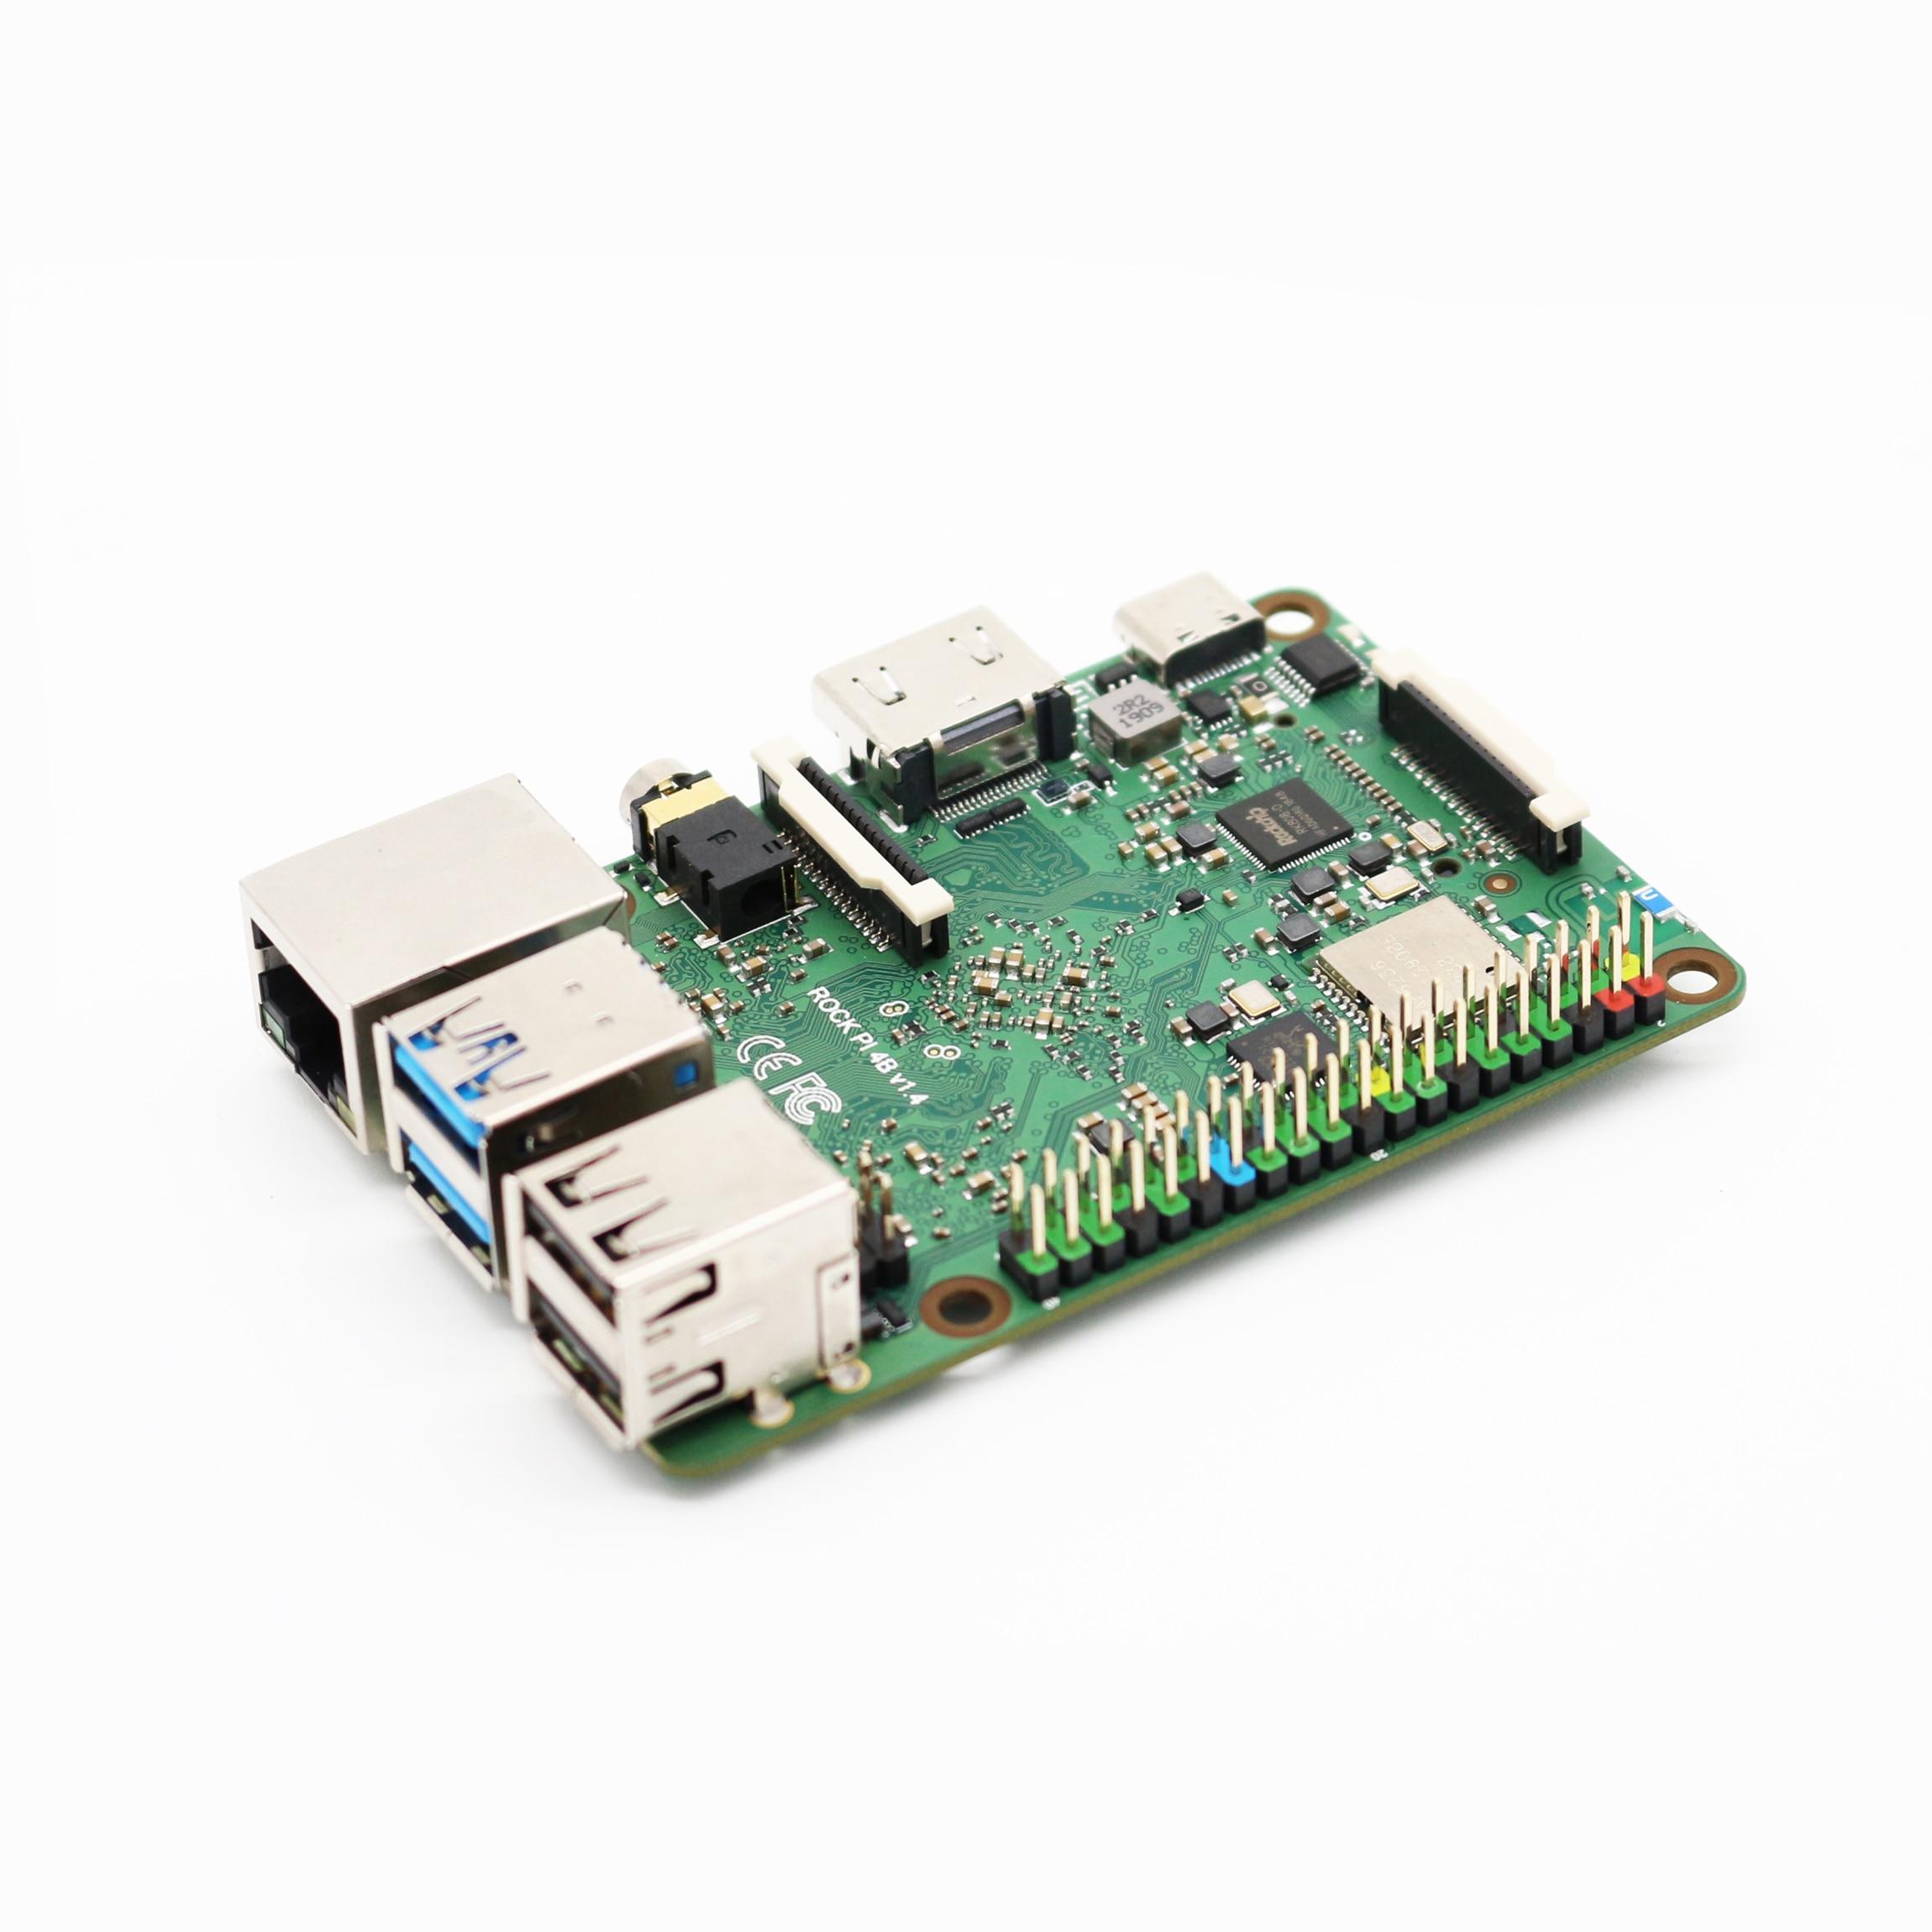 ShenzhenMaker Loja ROCHA Pi 4B V1.4-RK3399 64 Bit Hexa Core CPU-4 GB LPDDR4 RAM-HDMI 2.0 até 4k @ 60